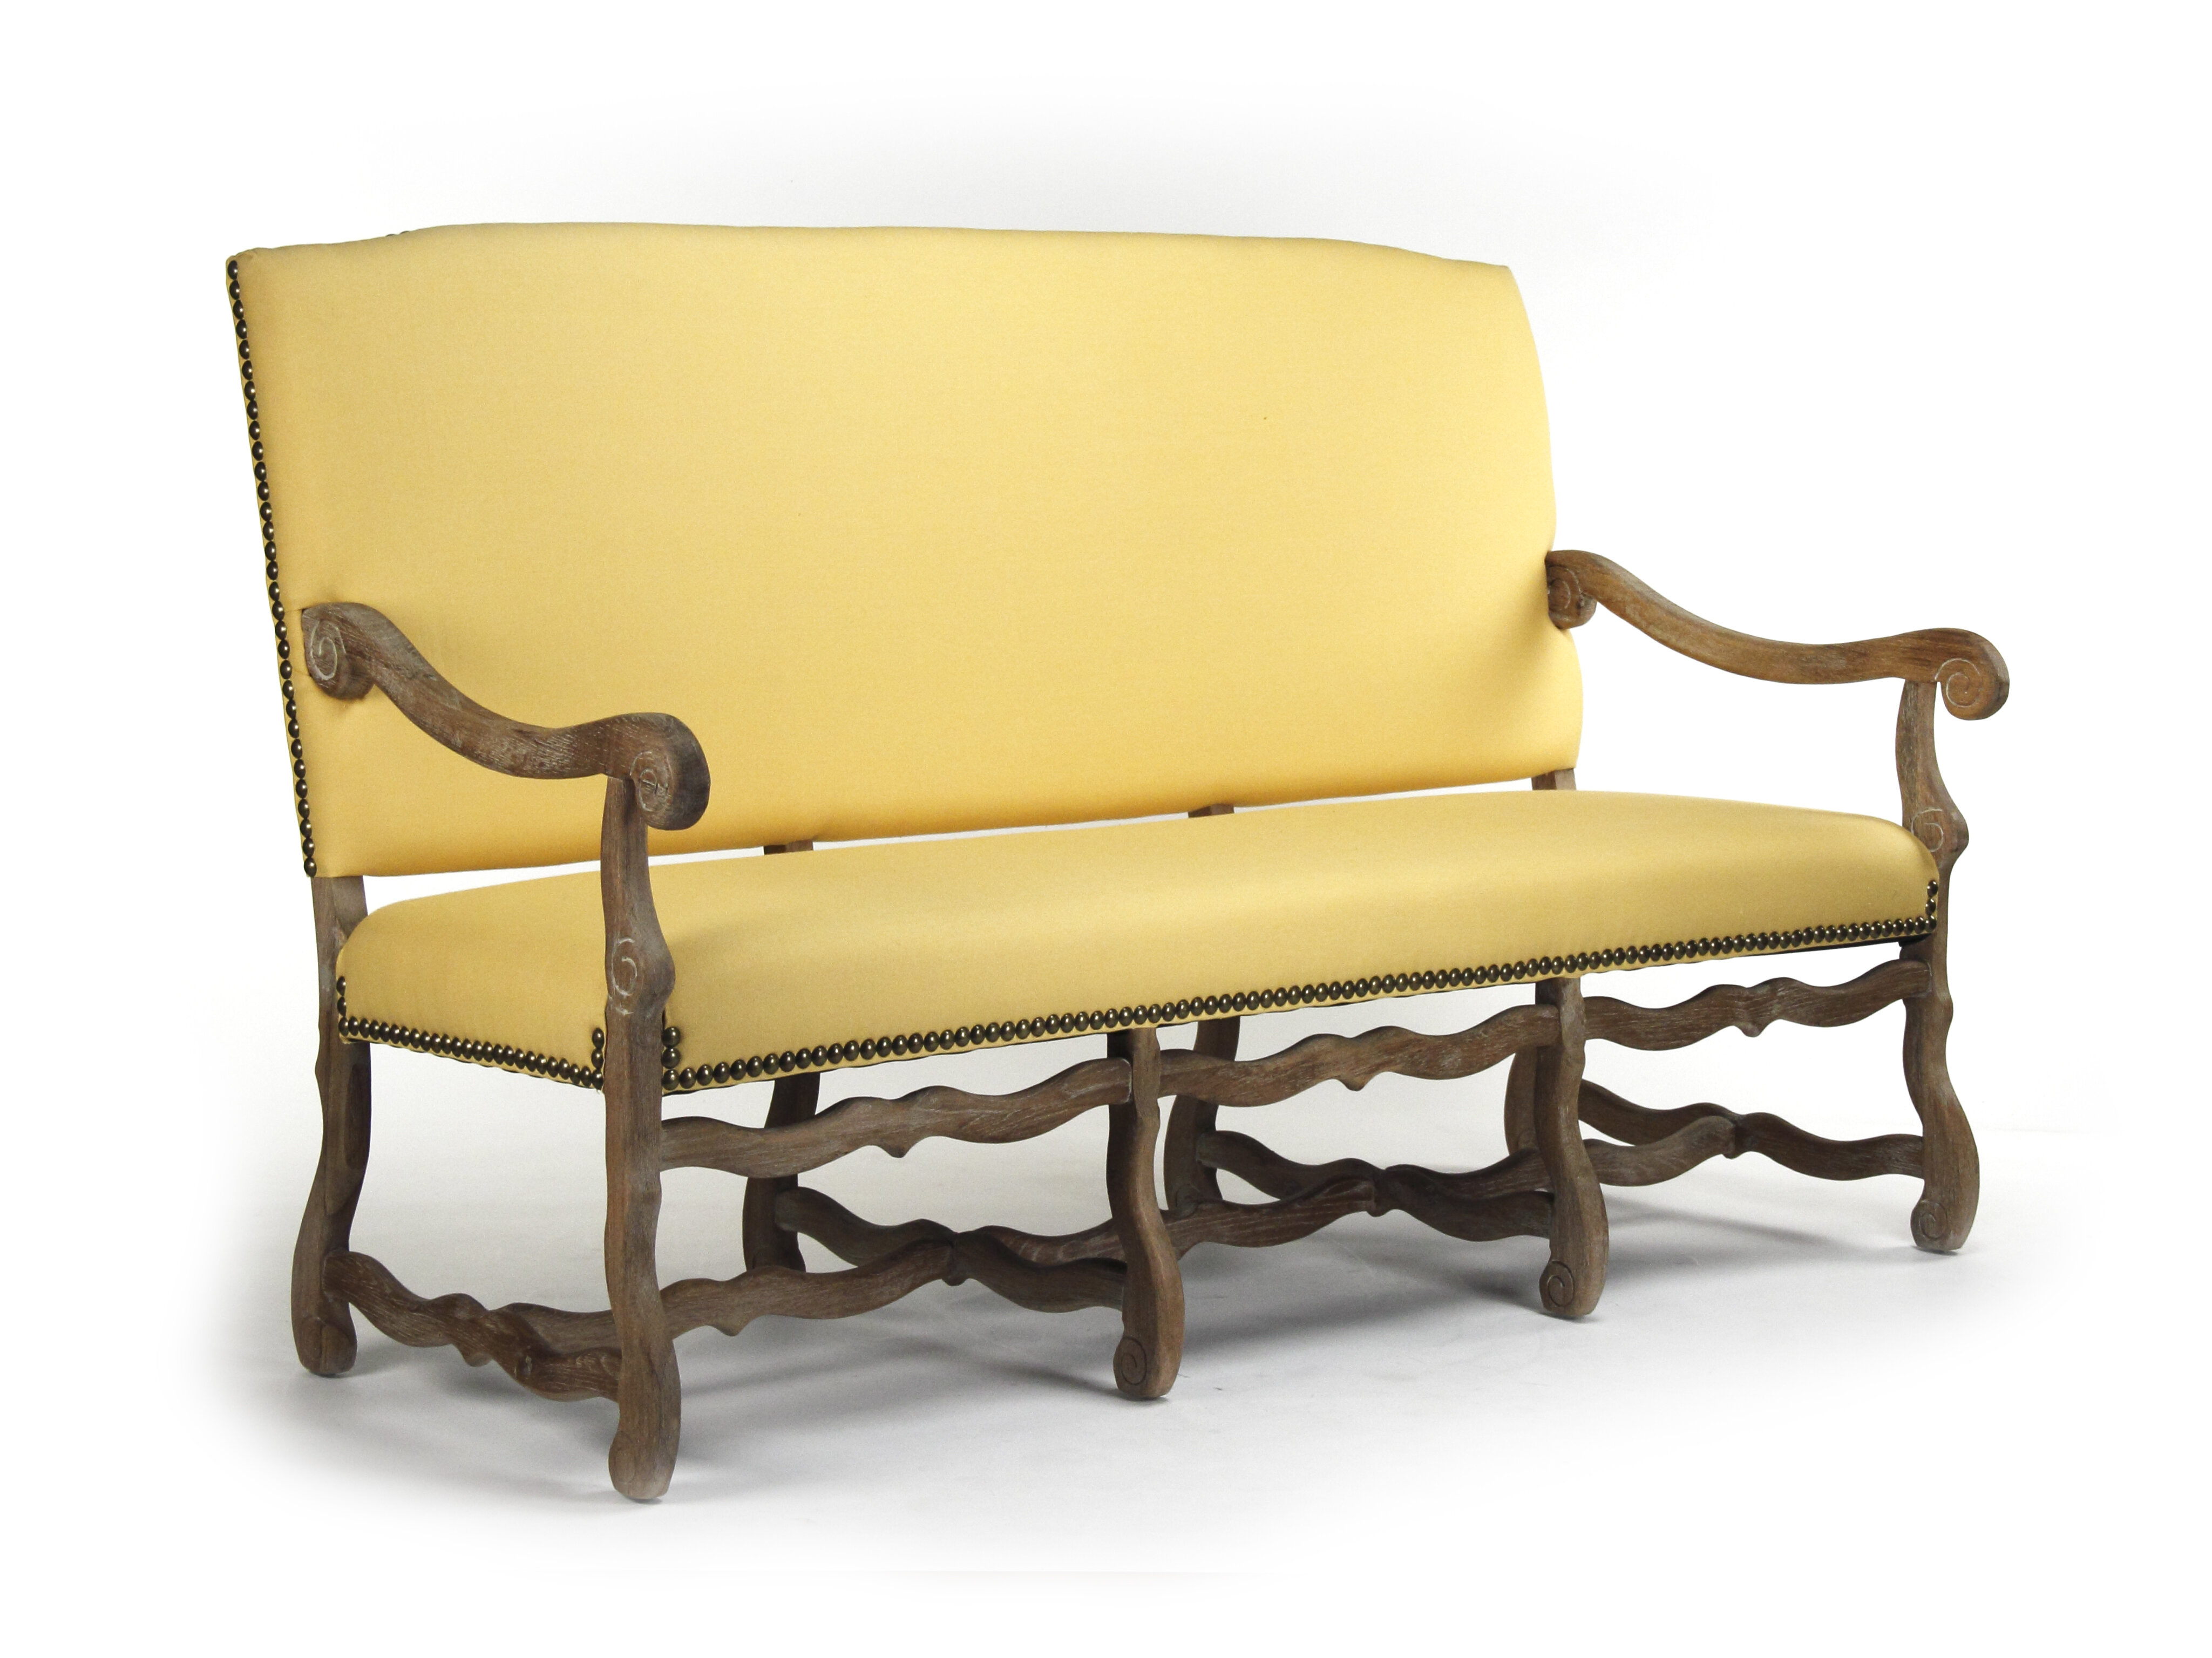 Julien Upholstered Bench By Zentique